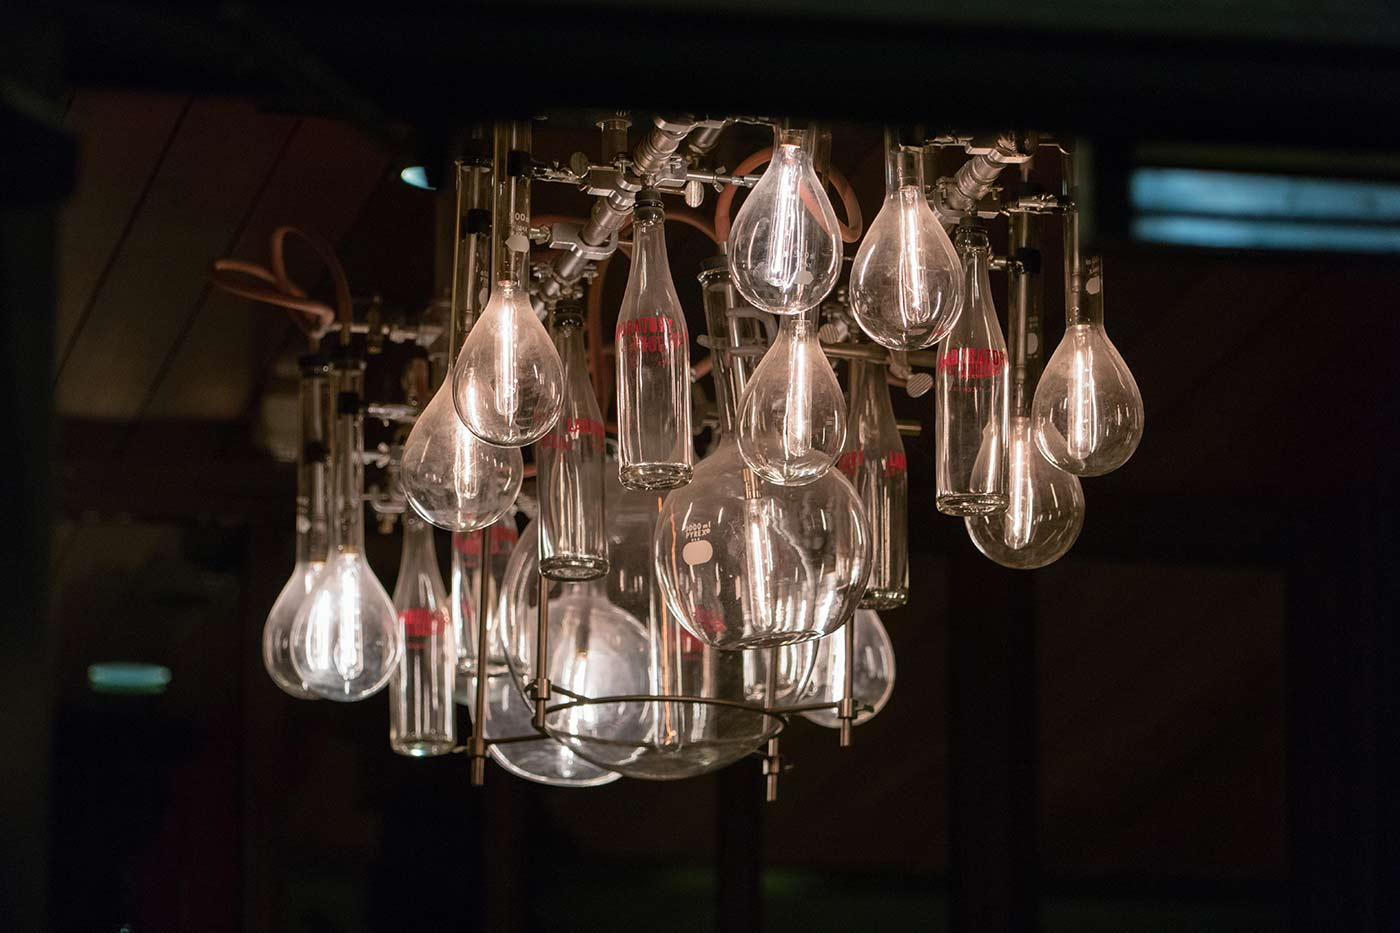 Laboratory beaker chandelier.